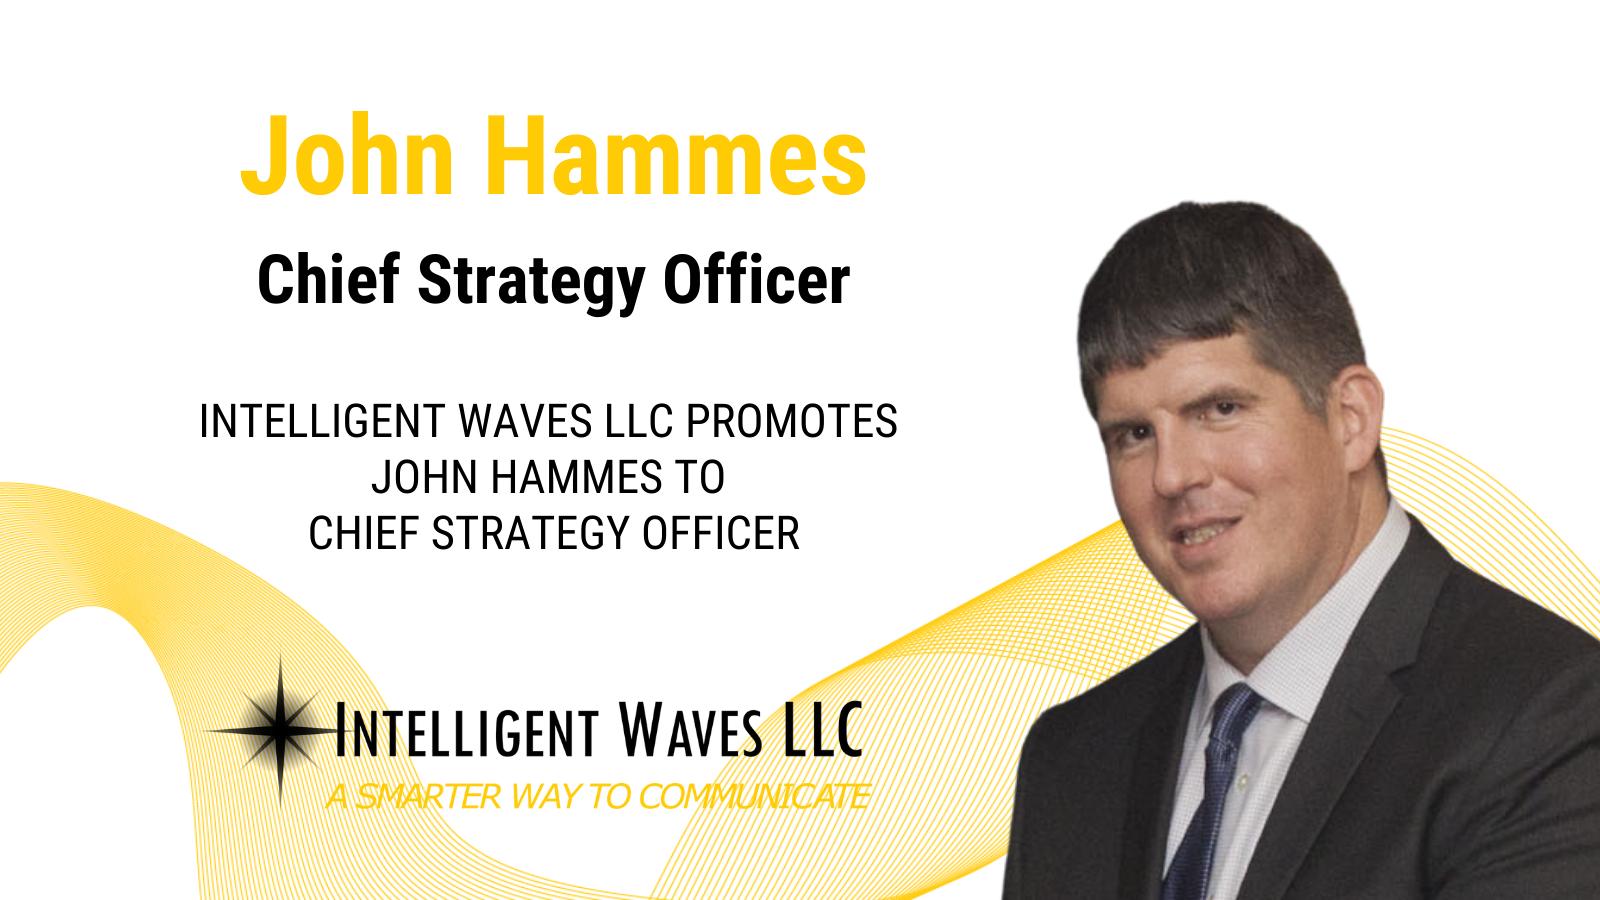 John Hammes promotion social graphic